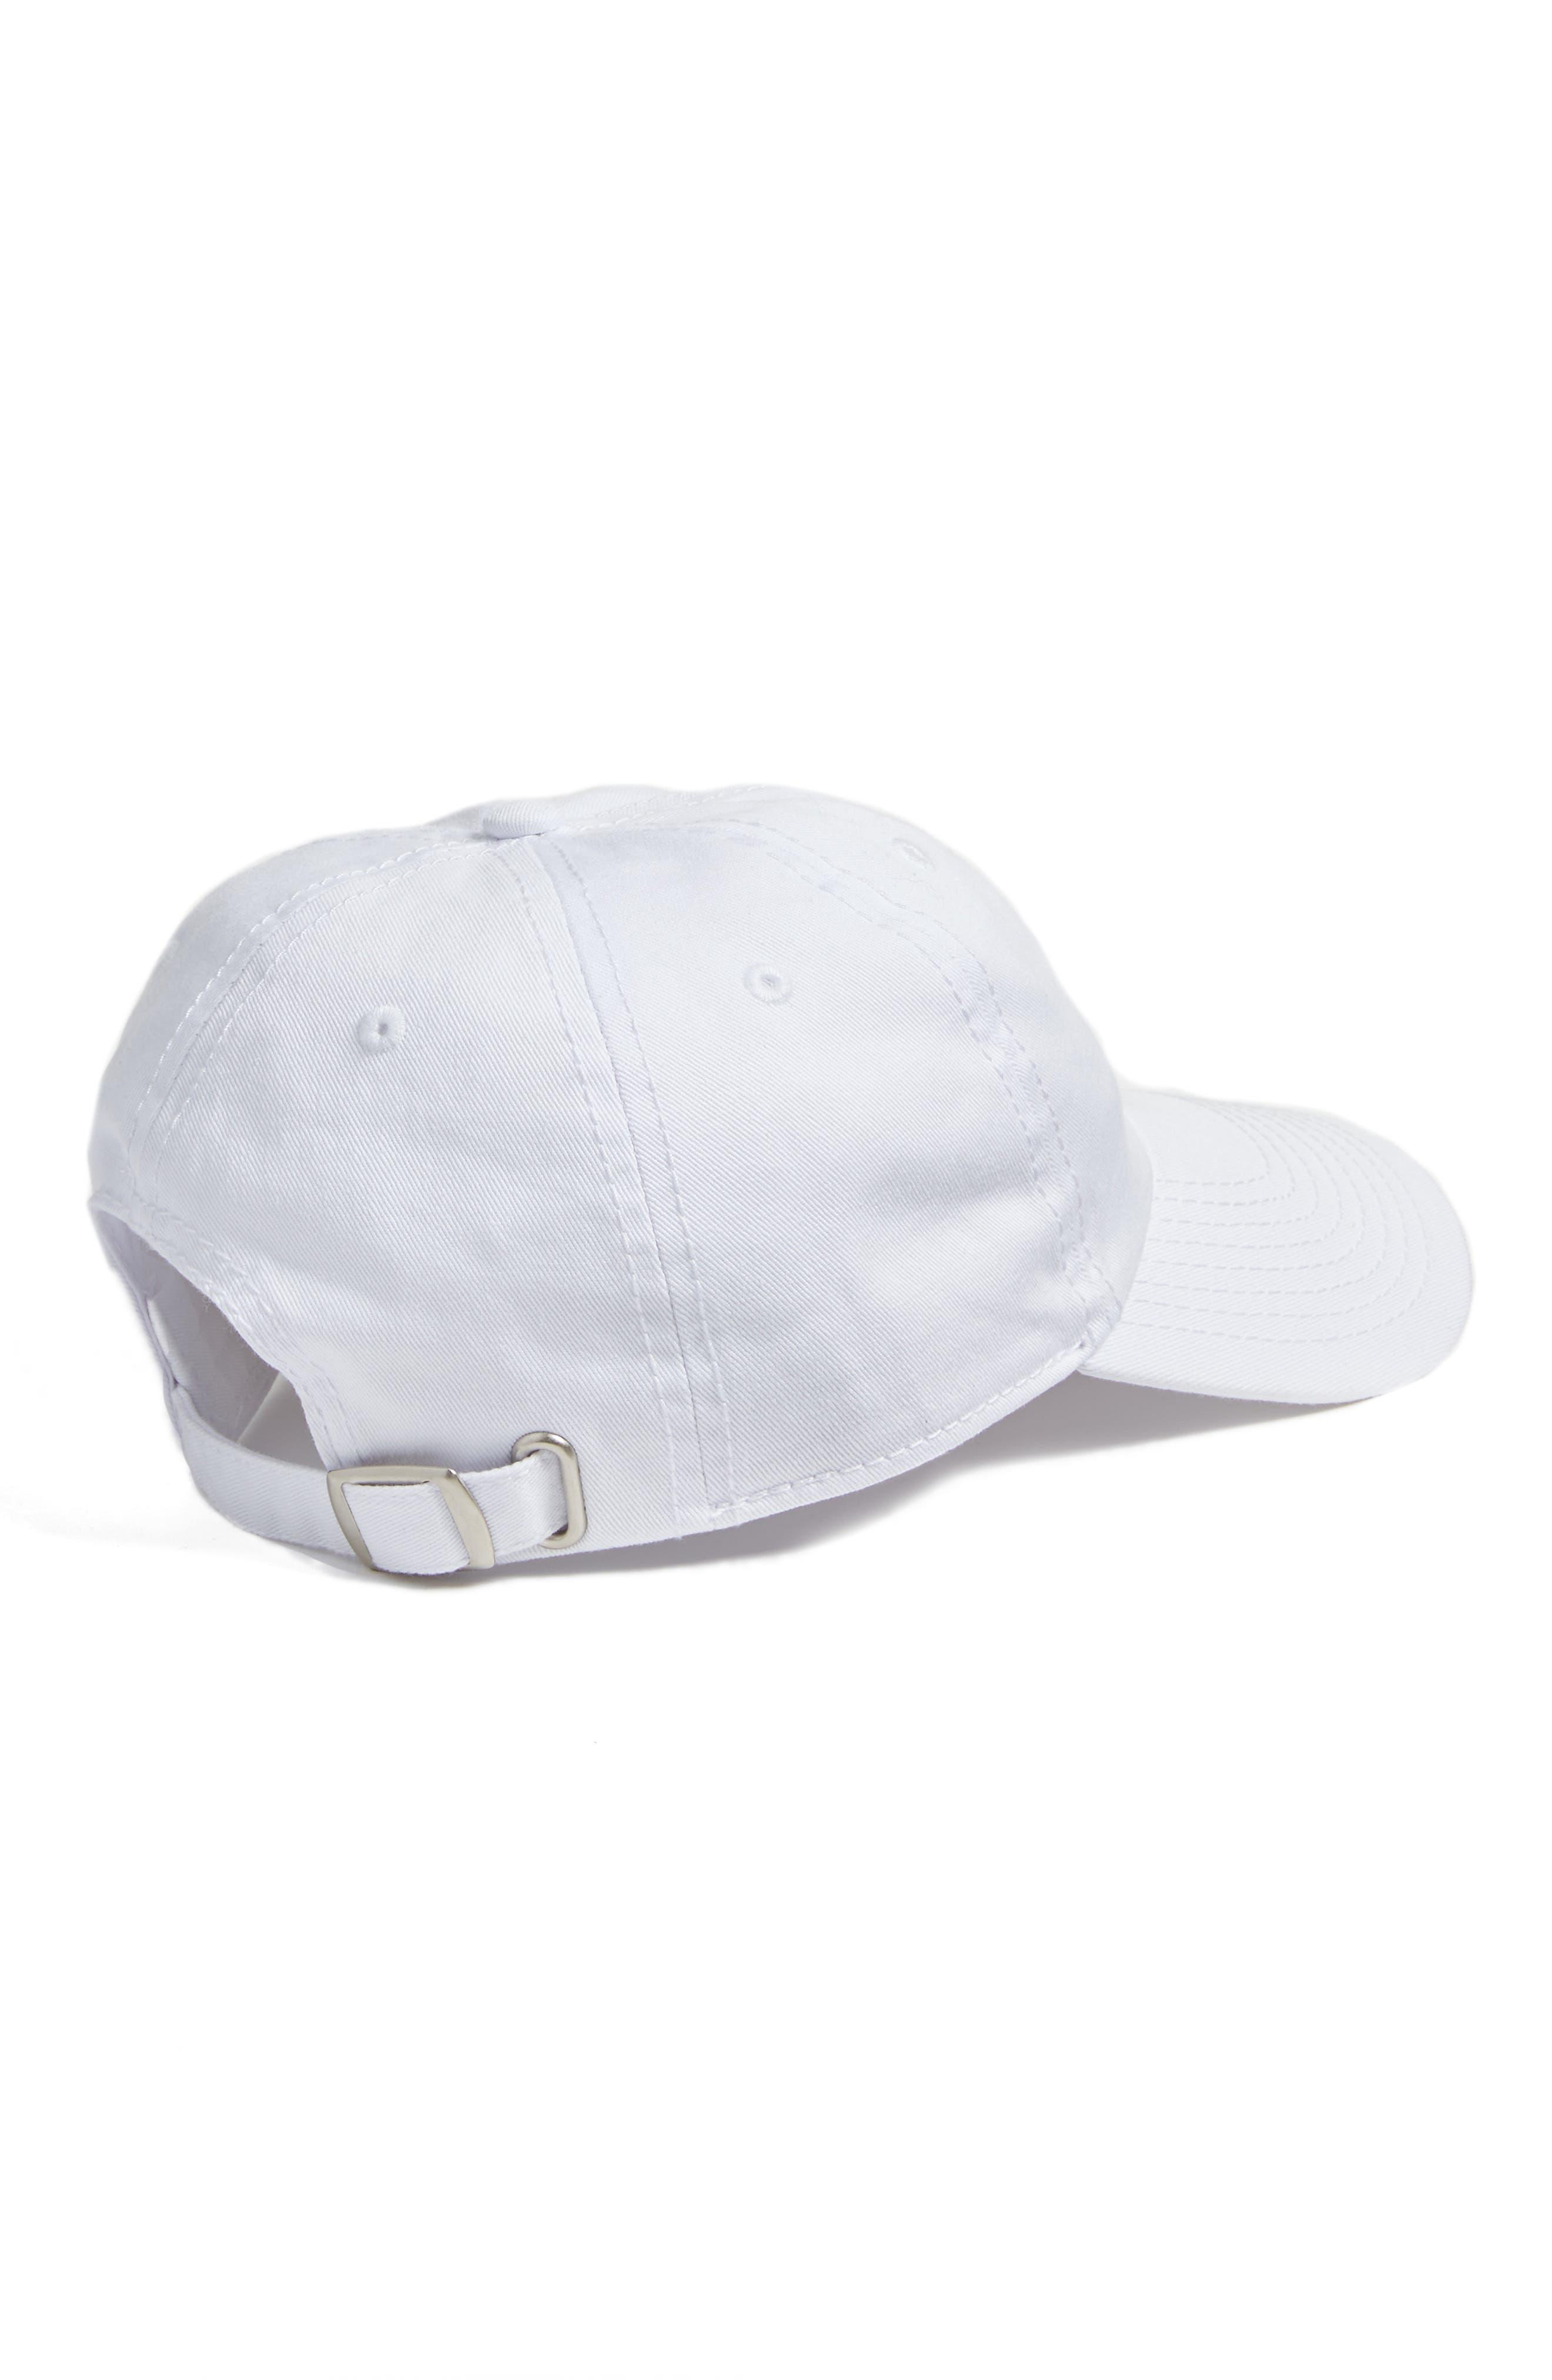 Micro Heart Baseball Cap,                             Alternate thumbnail 2, color,                             White